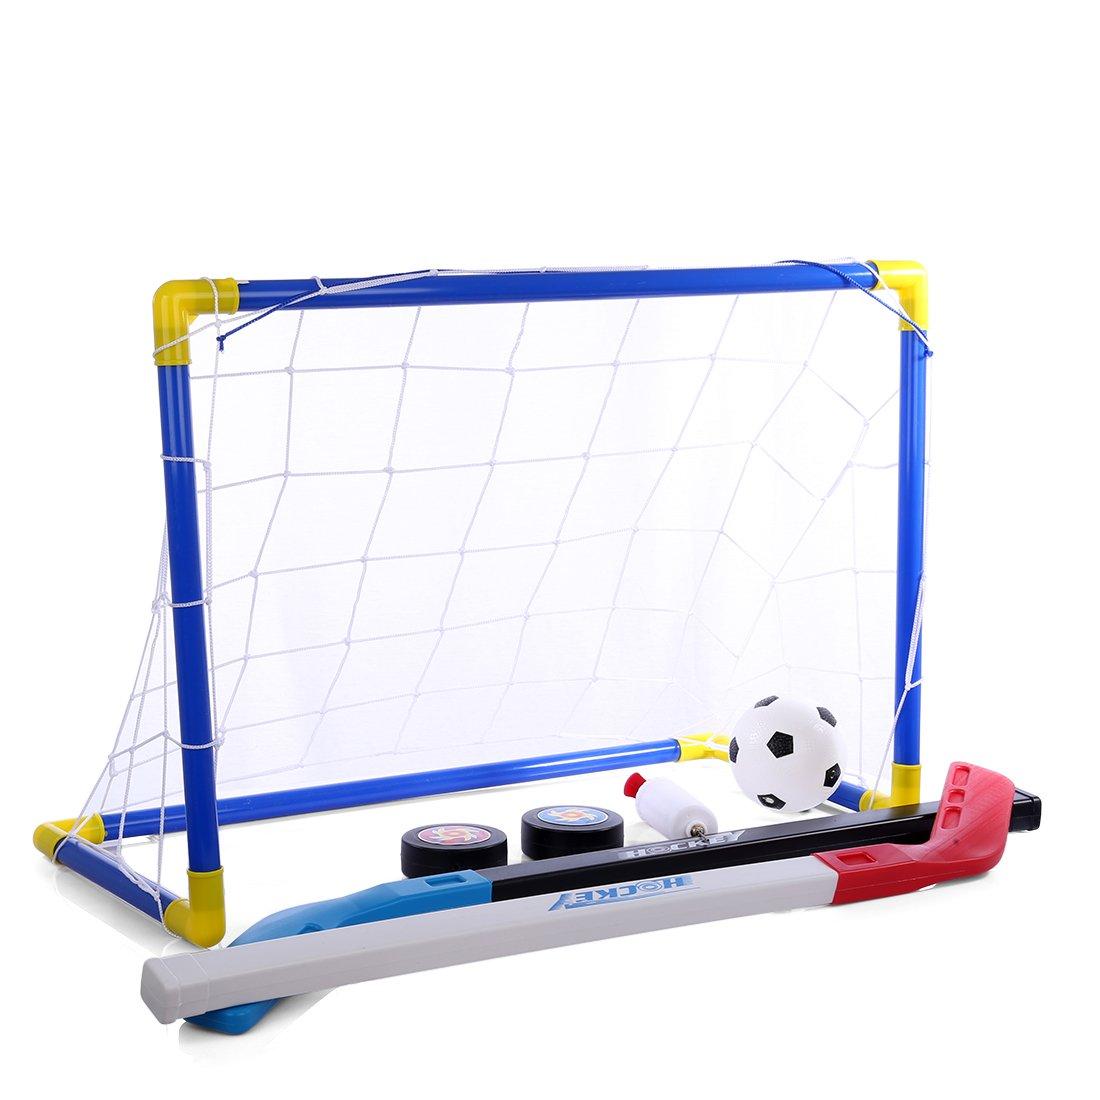 Kids Soccer Goal RuiyiF 2-In-1 Soccer Goal Net Ice Hockey Puck Set for Kids Toddlers Indoor Outdoor Backyard